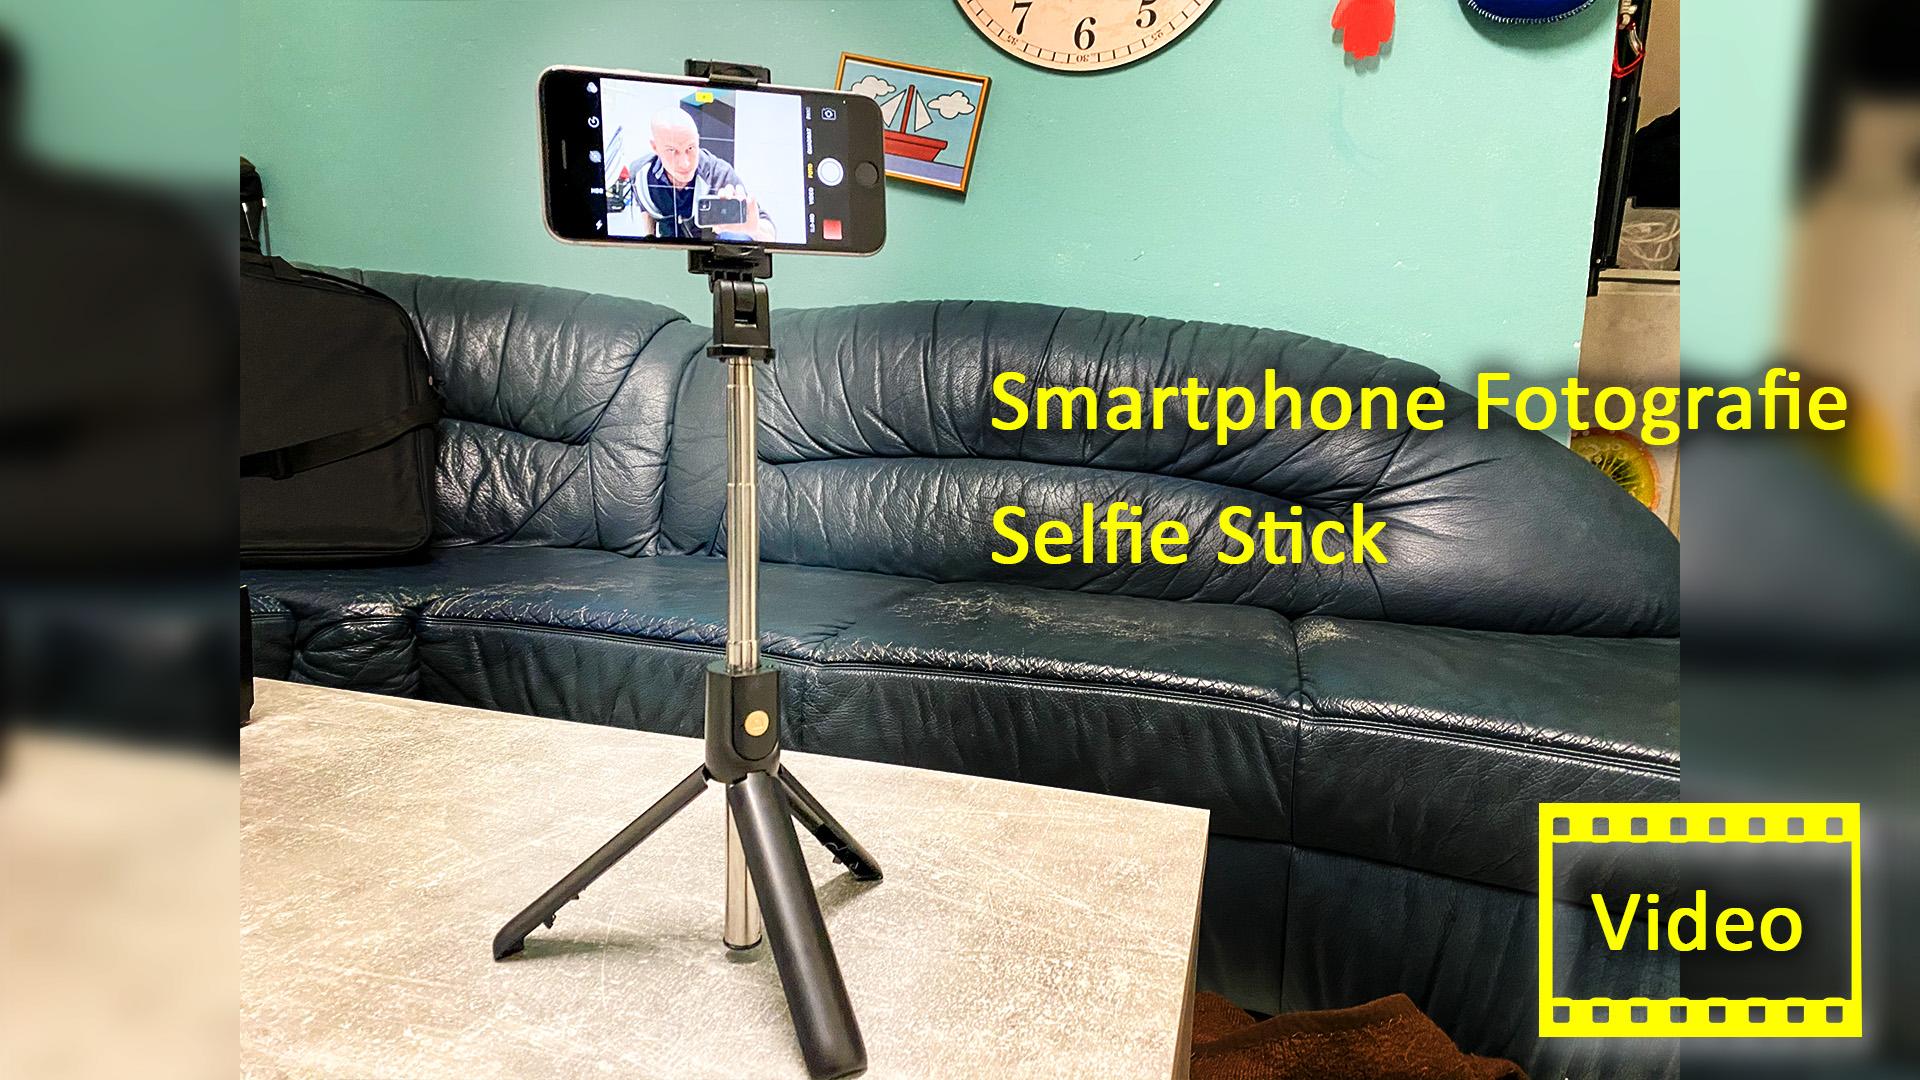 Smartphone Fotografie Selfie Stick